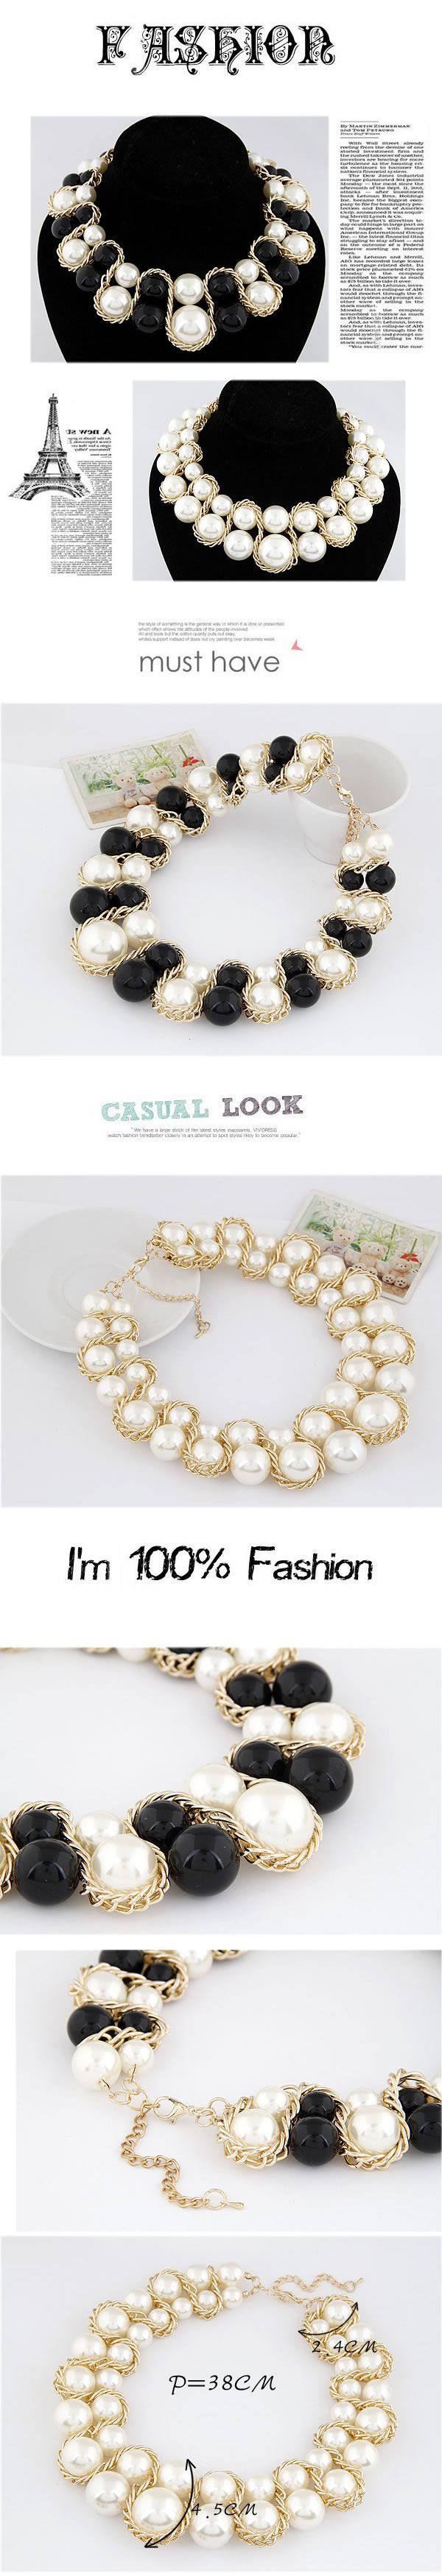 Big Pearls Weave Design. Just my favorite.